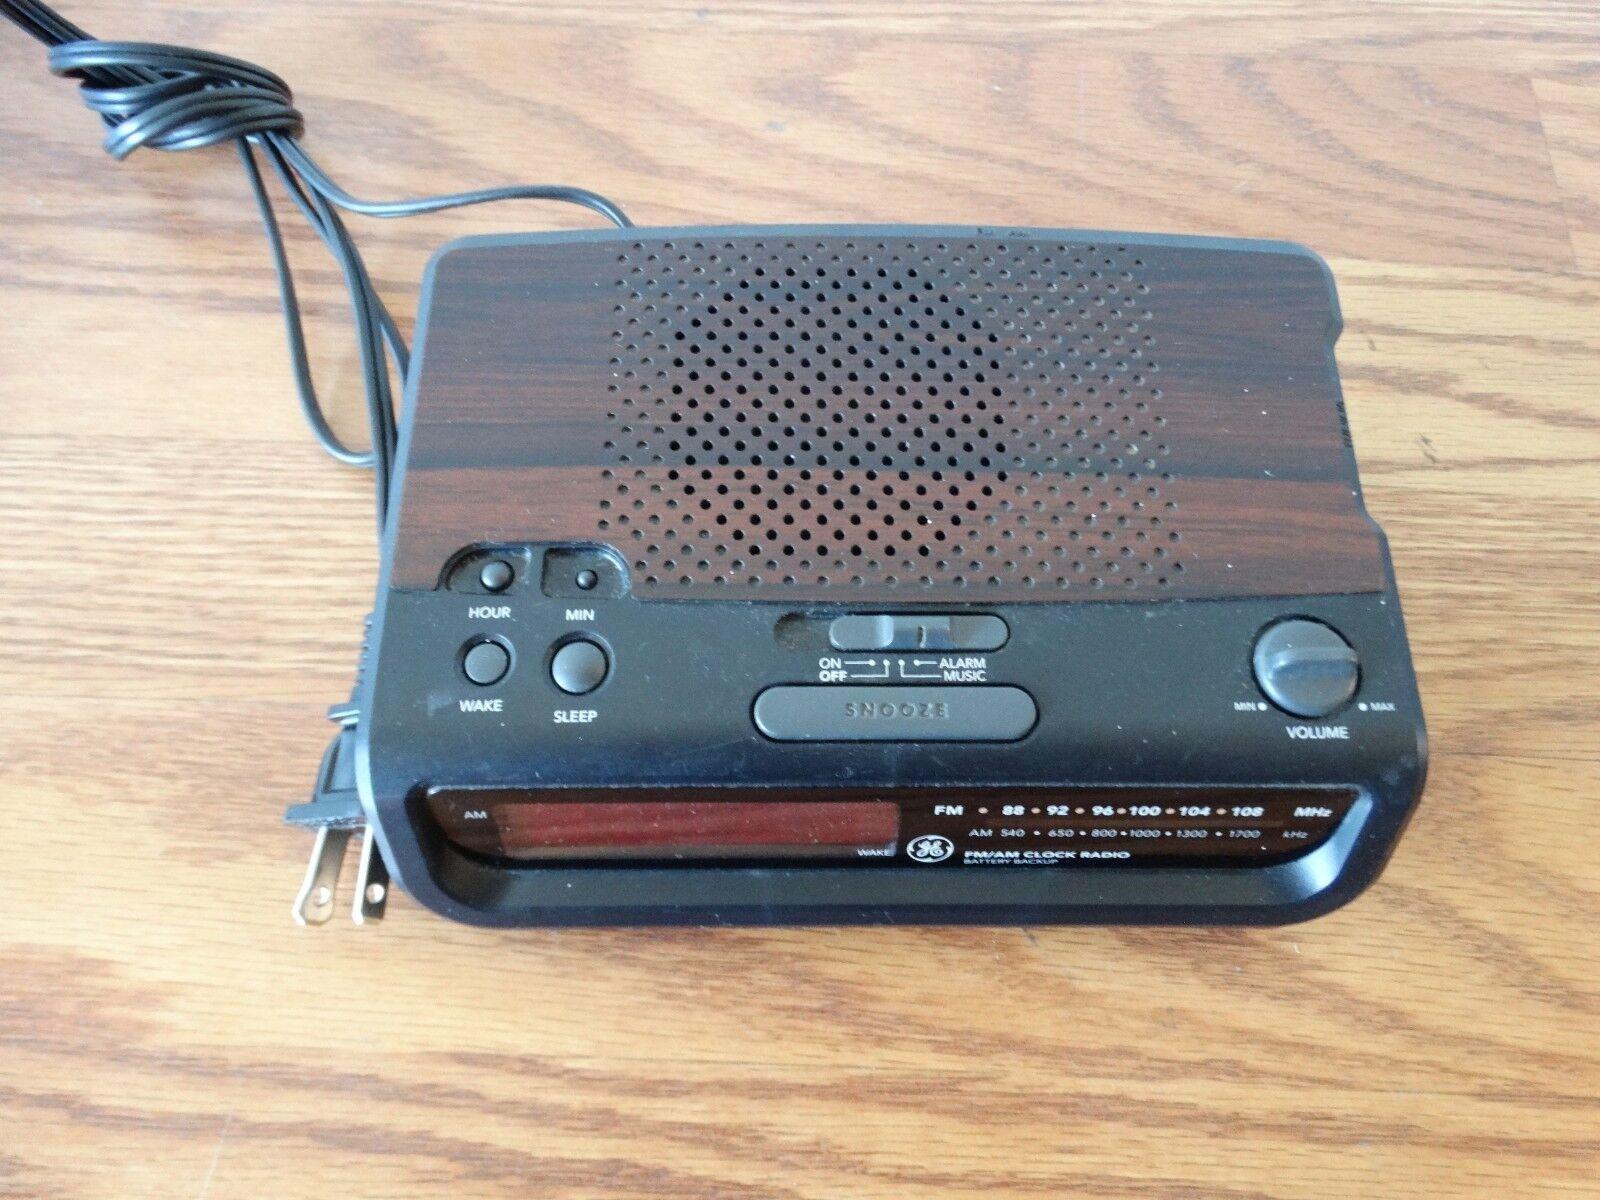 Vintage GE 7-4613A AM/FM Digital Clock Radio Alarm Snooze Tested Working